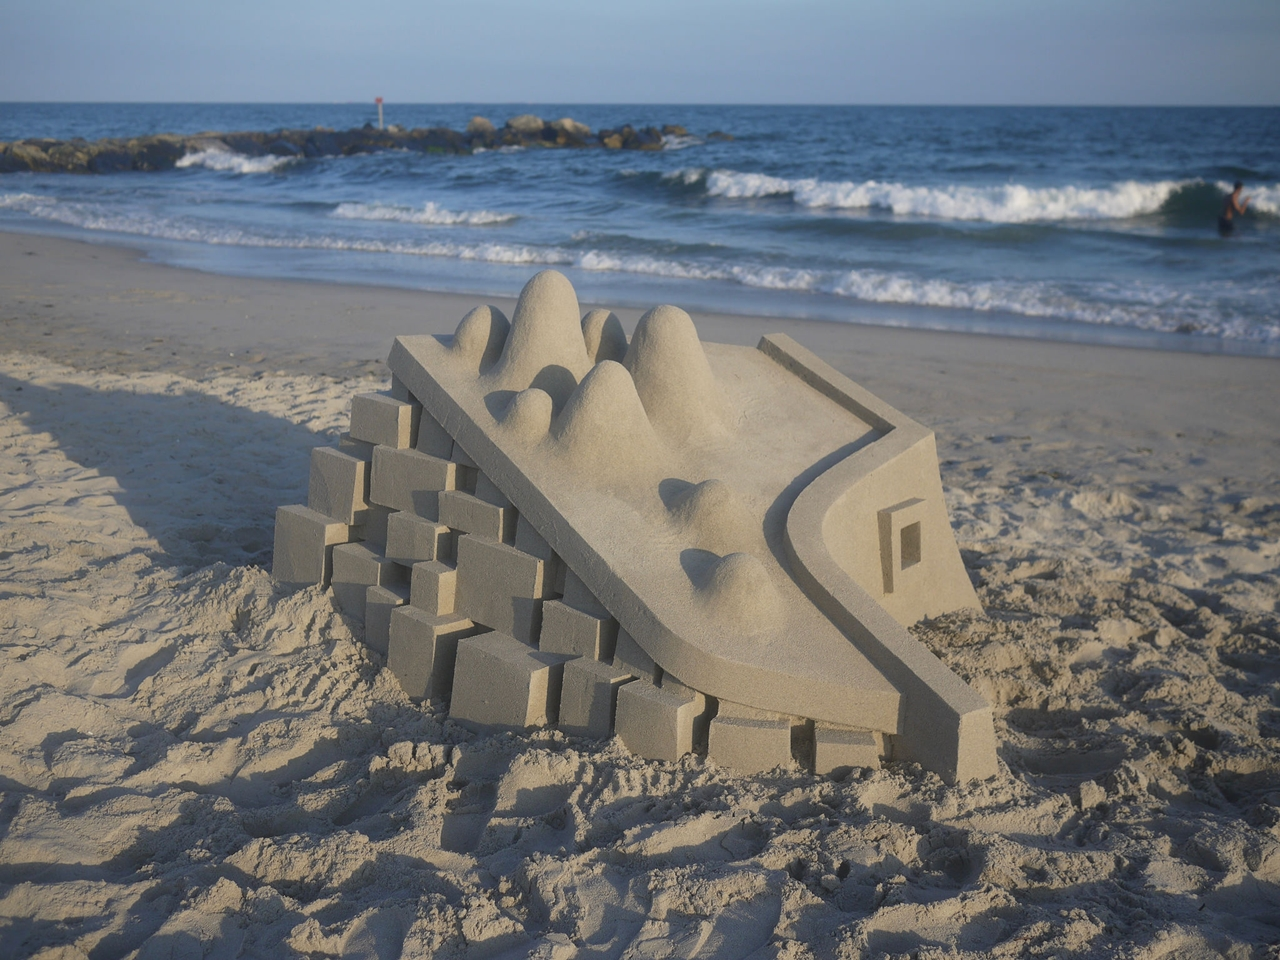 sand-castles-06